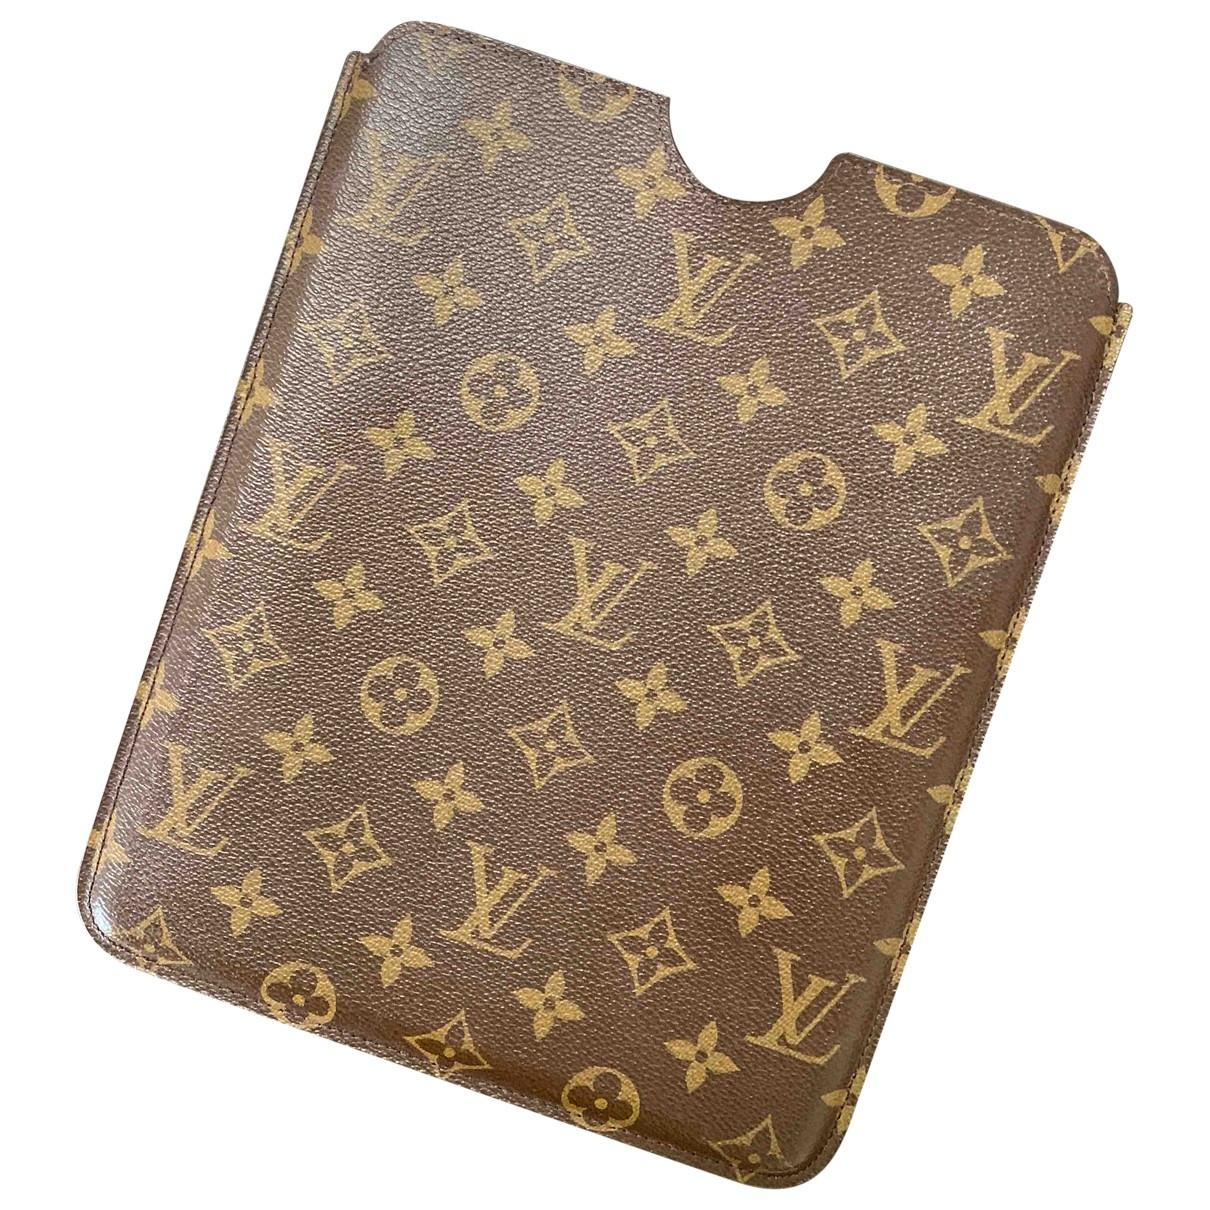 Funda ipad de Lona Louis Vuitton